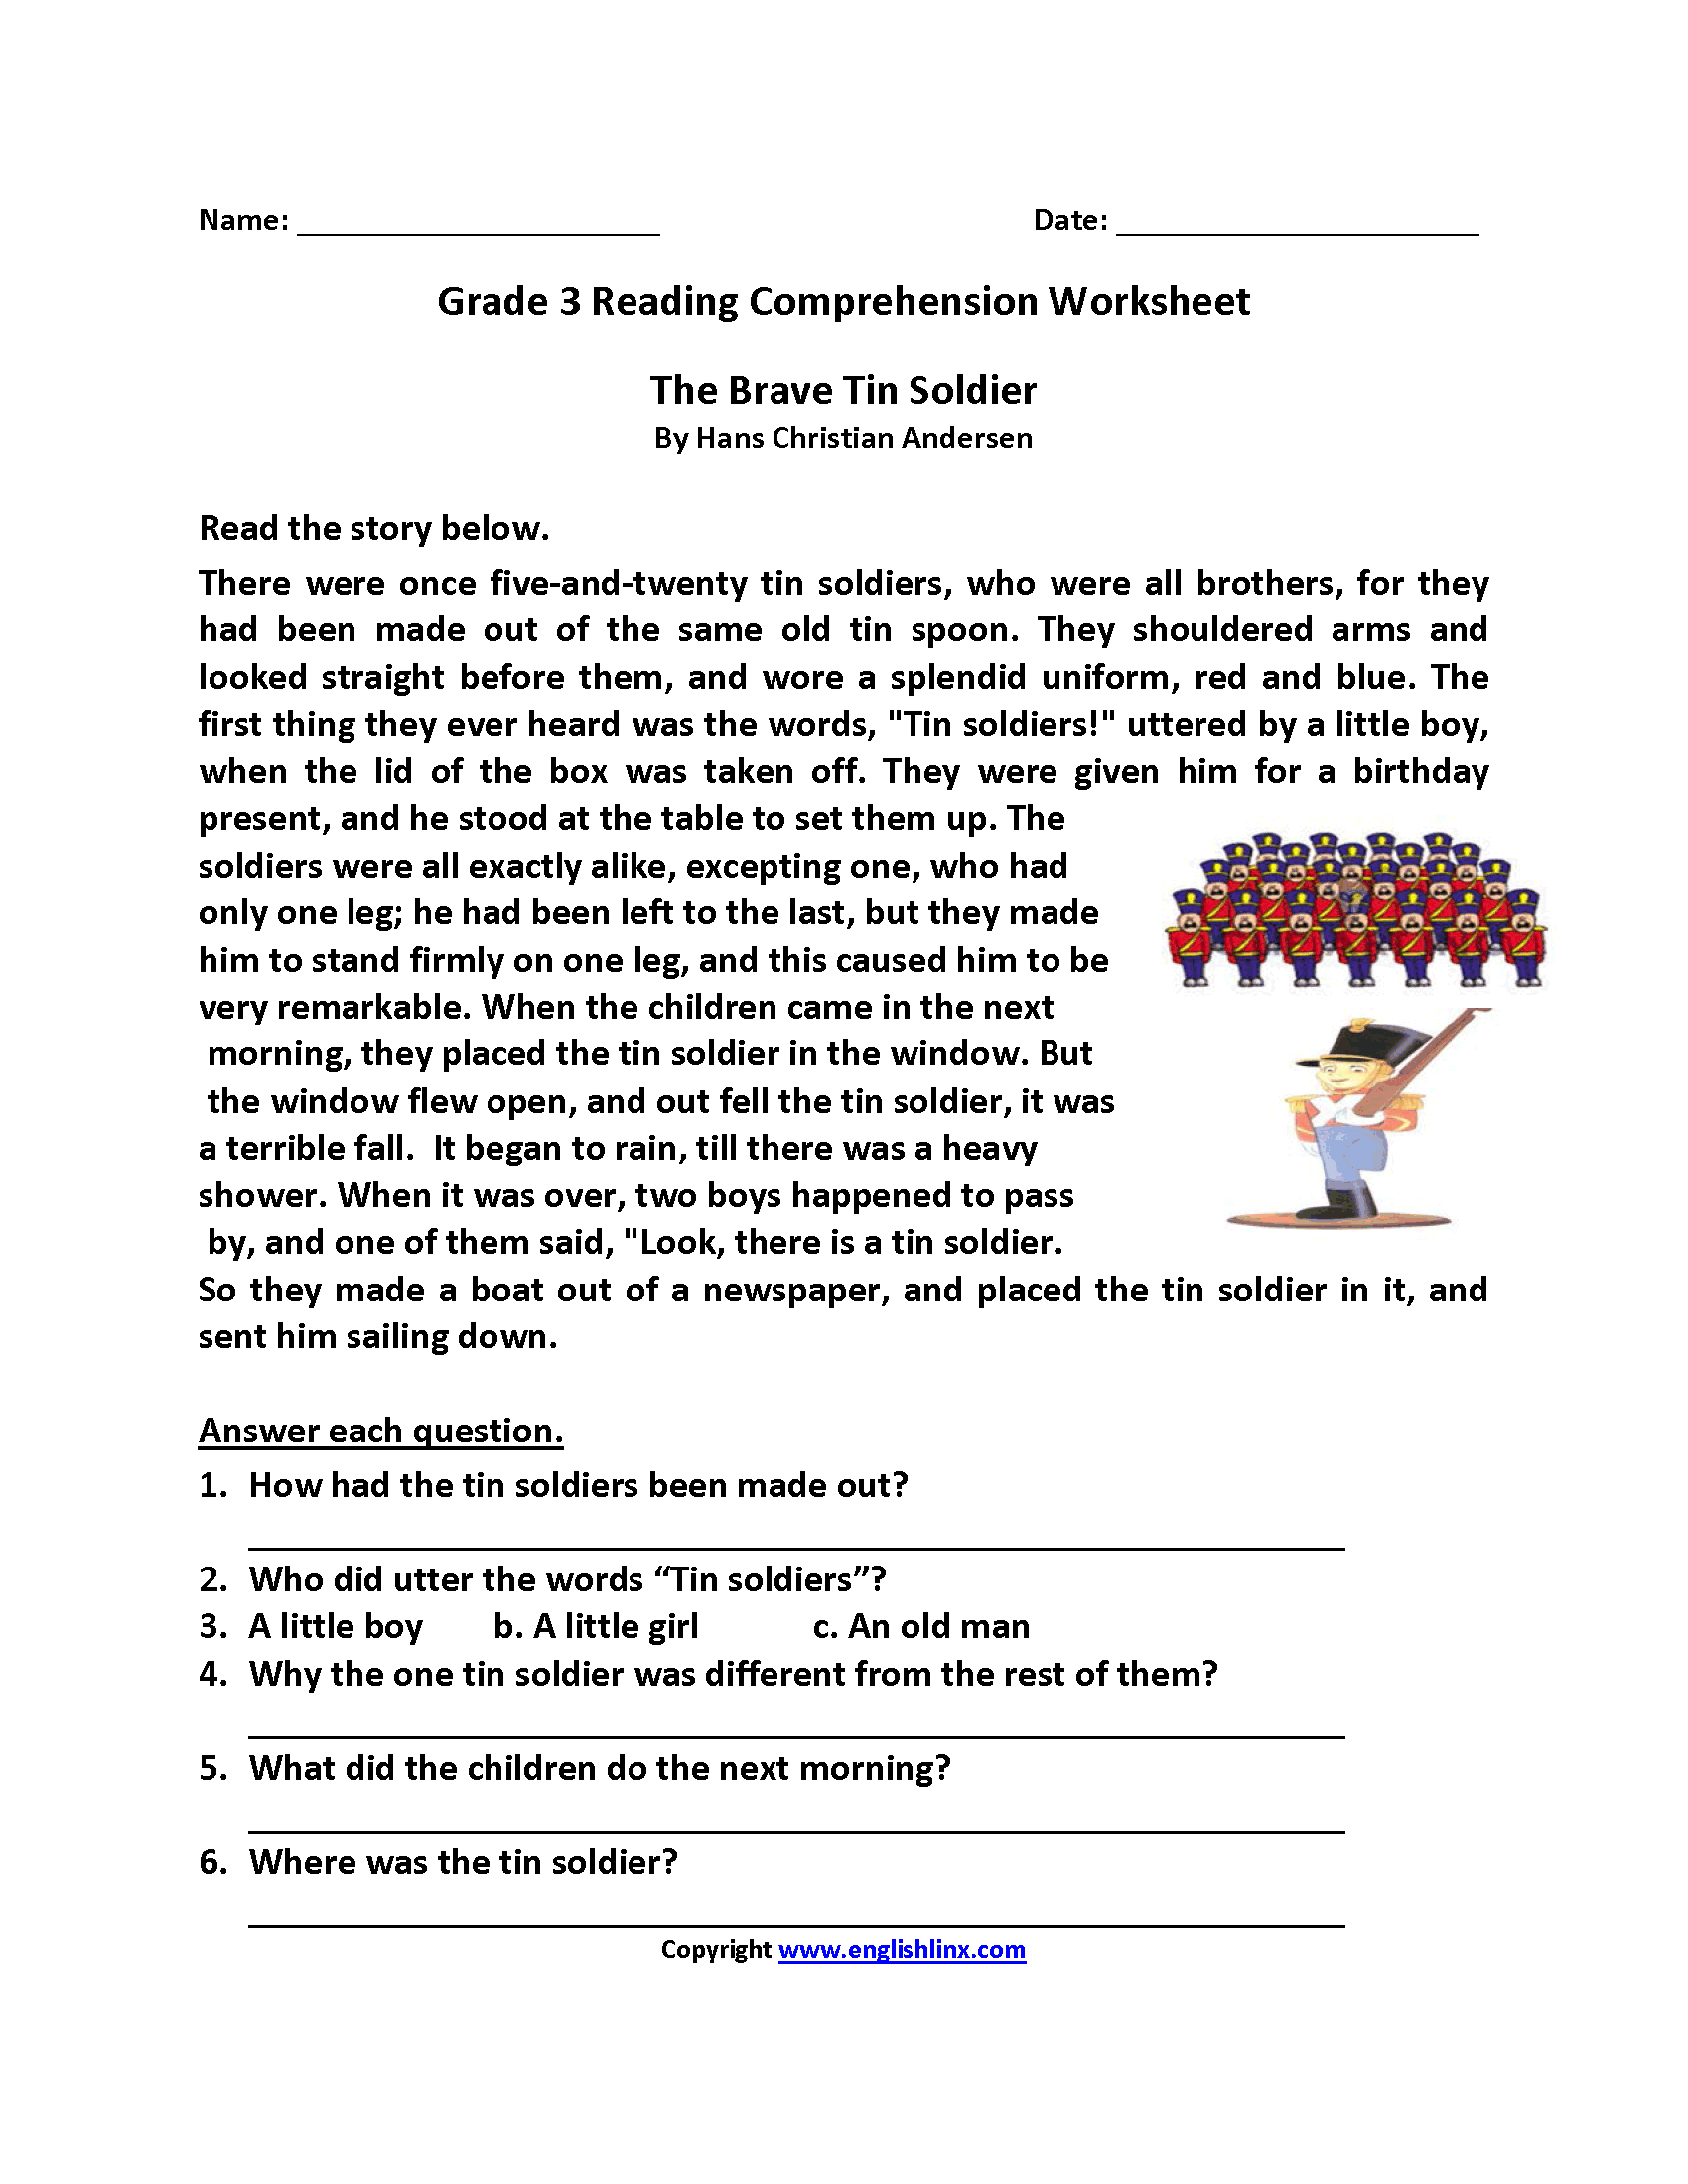 Free Printable Reading Comprehension Worksheets 3Rd Grade For Free   Third Grade Reading Worksheets Free Printable